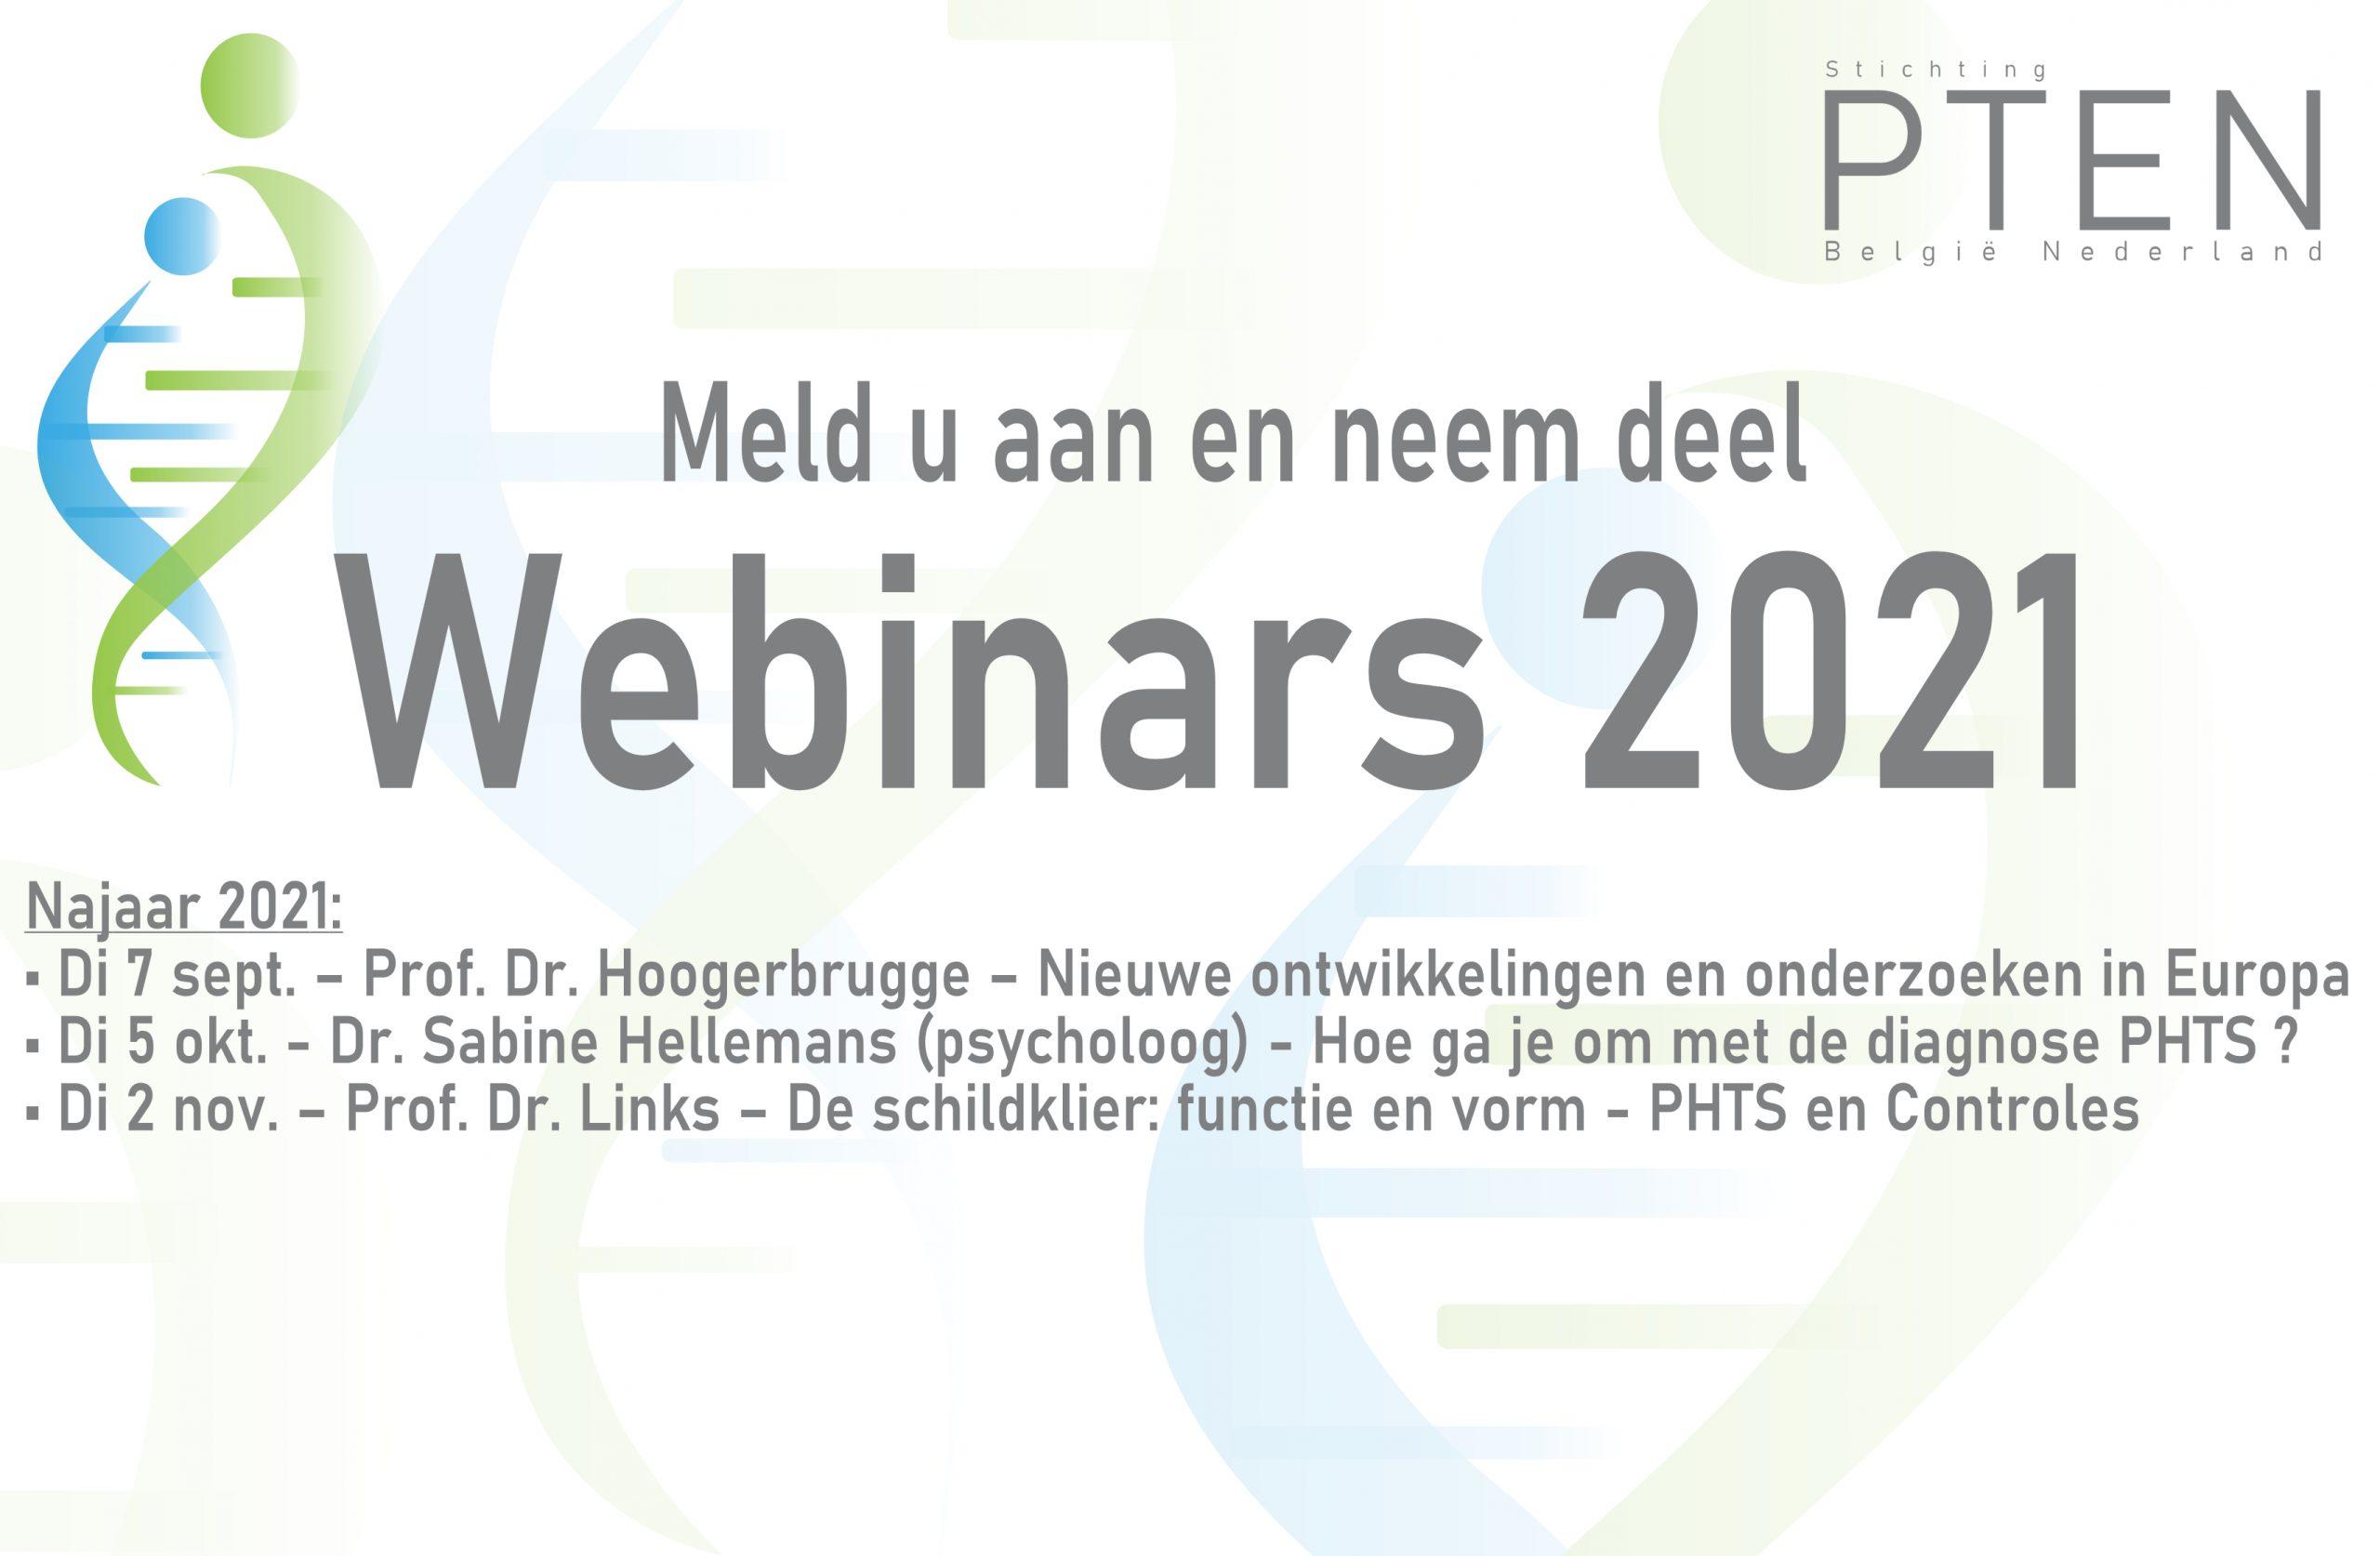 Webinars 2021